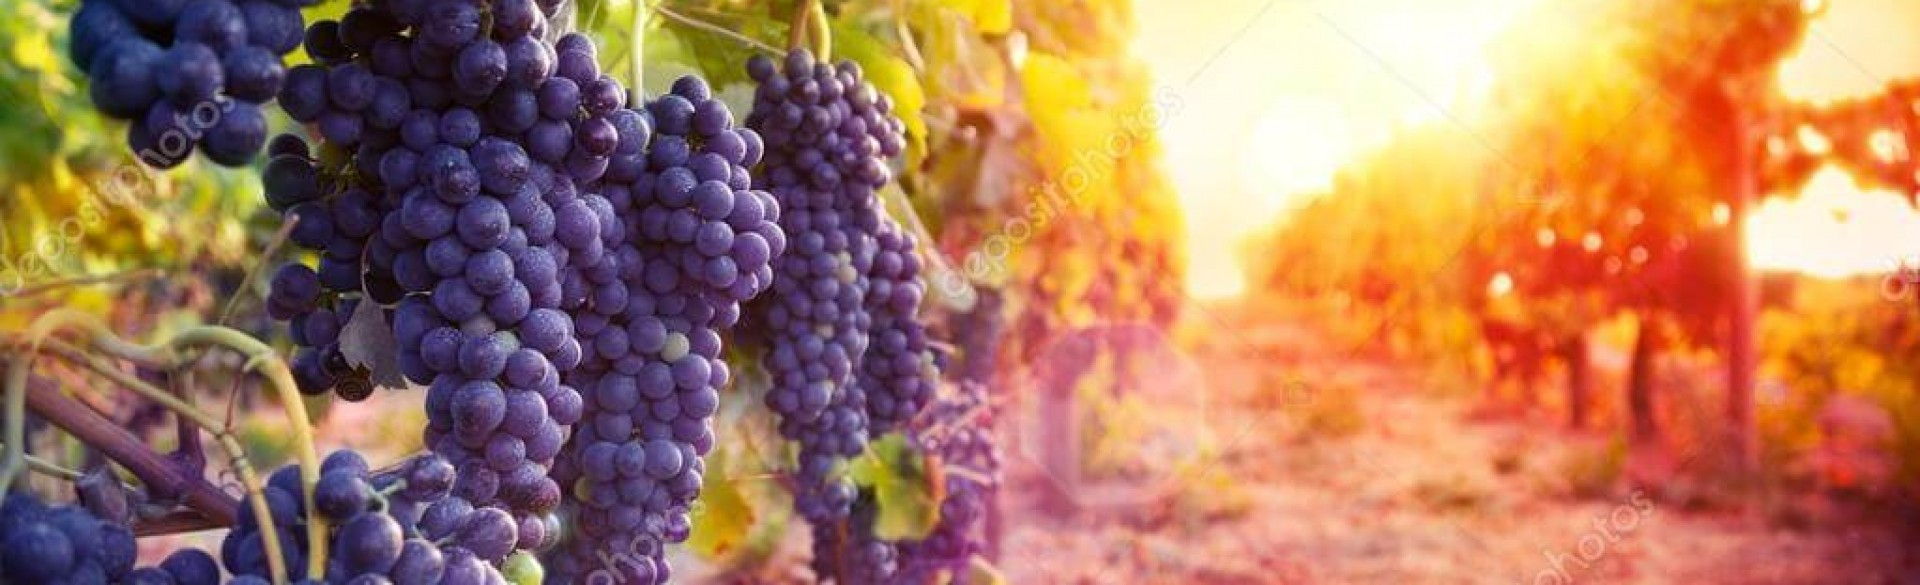 Грузинские вина BADAGONI